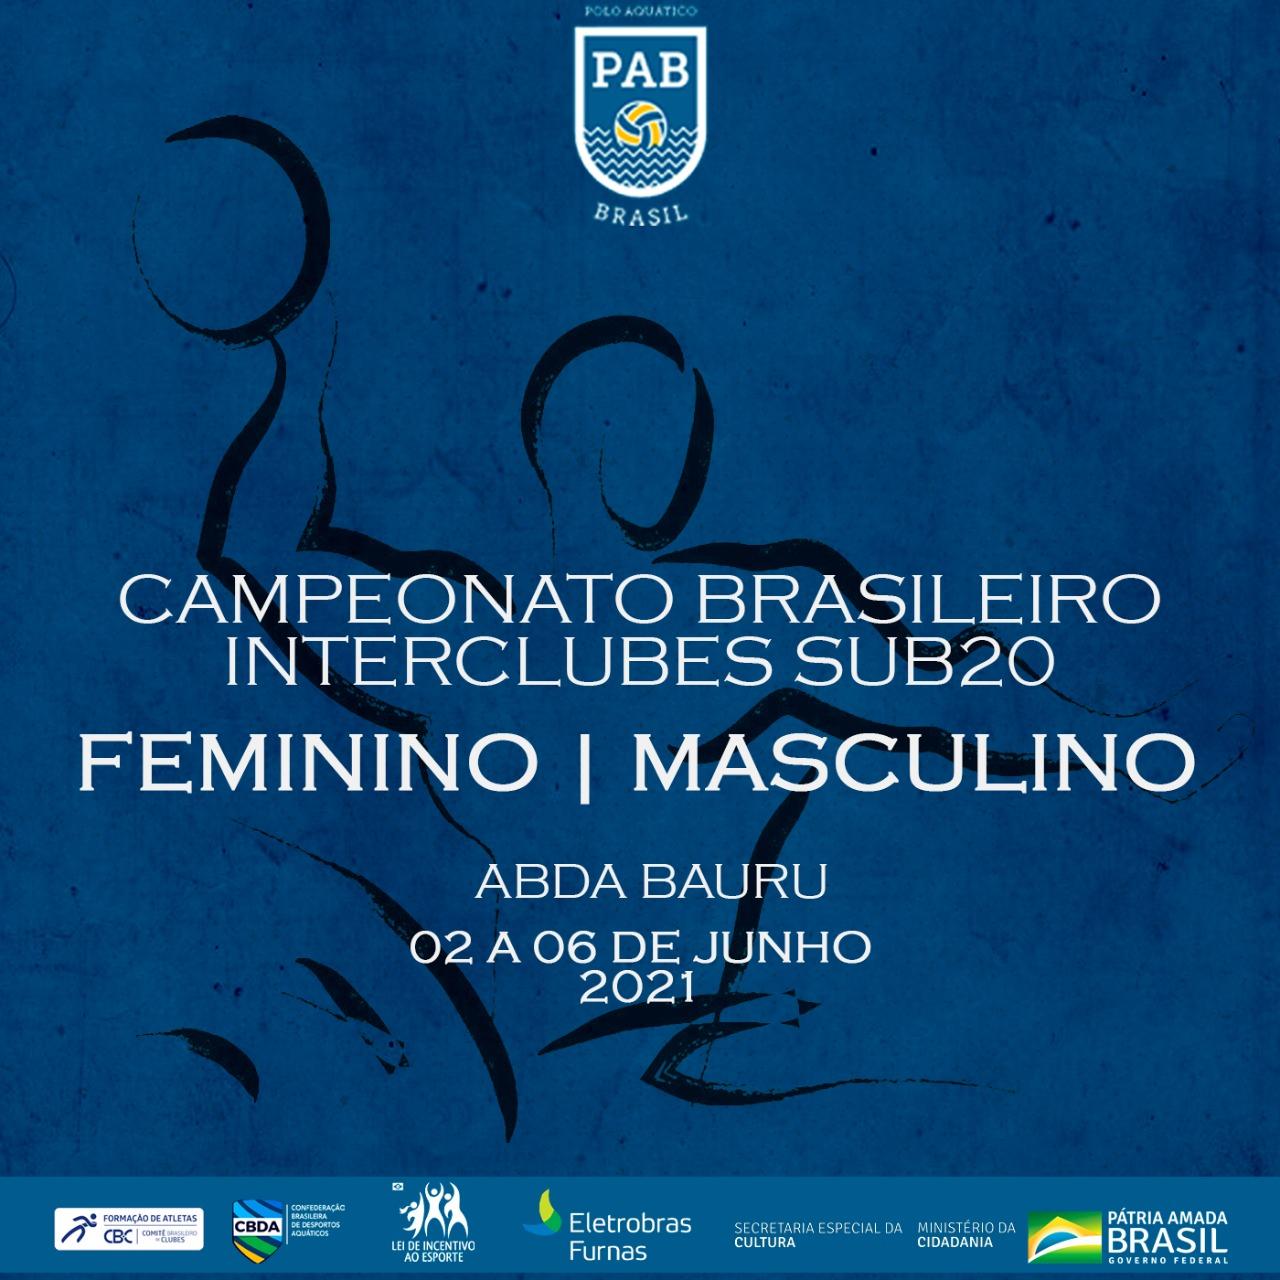 Campeonato Brasileiro Interclubes Sub 20 Masculino - 2021